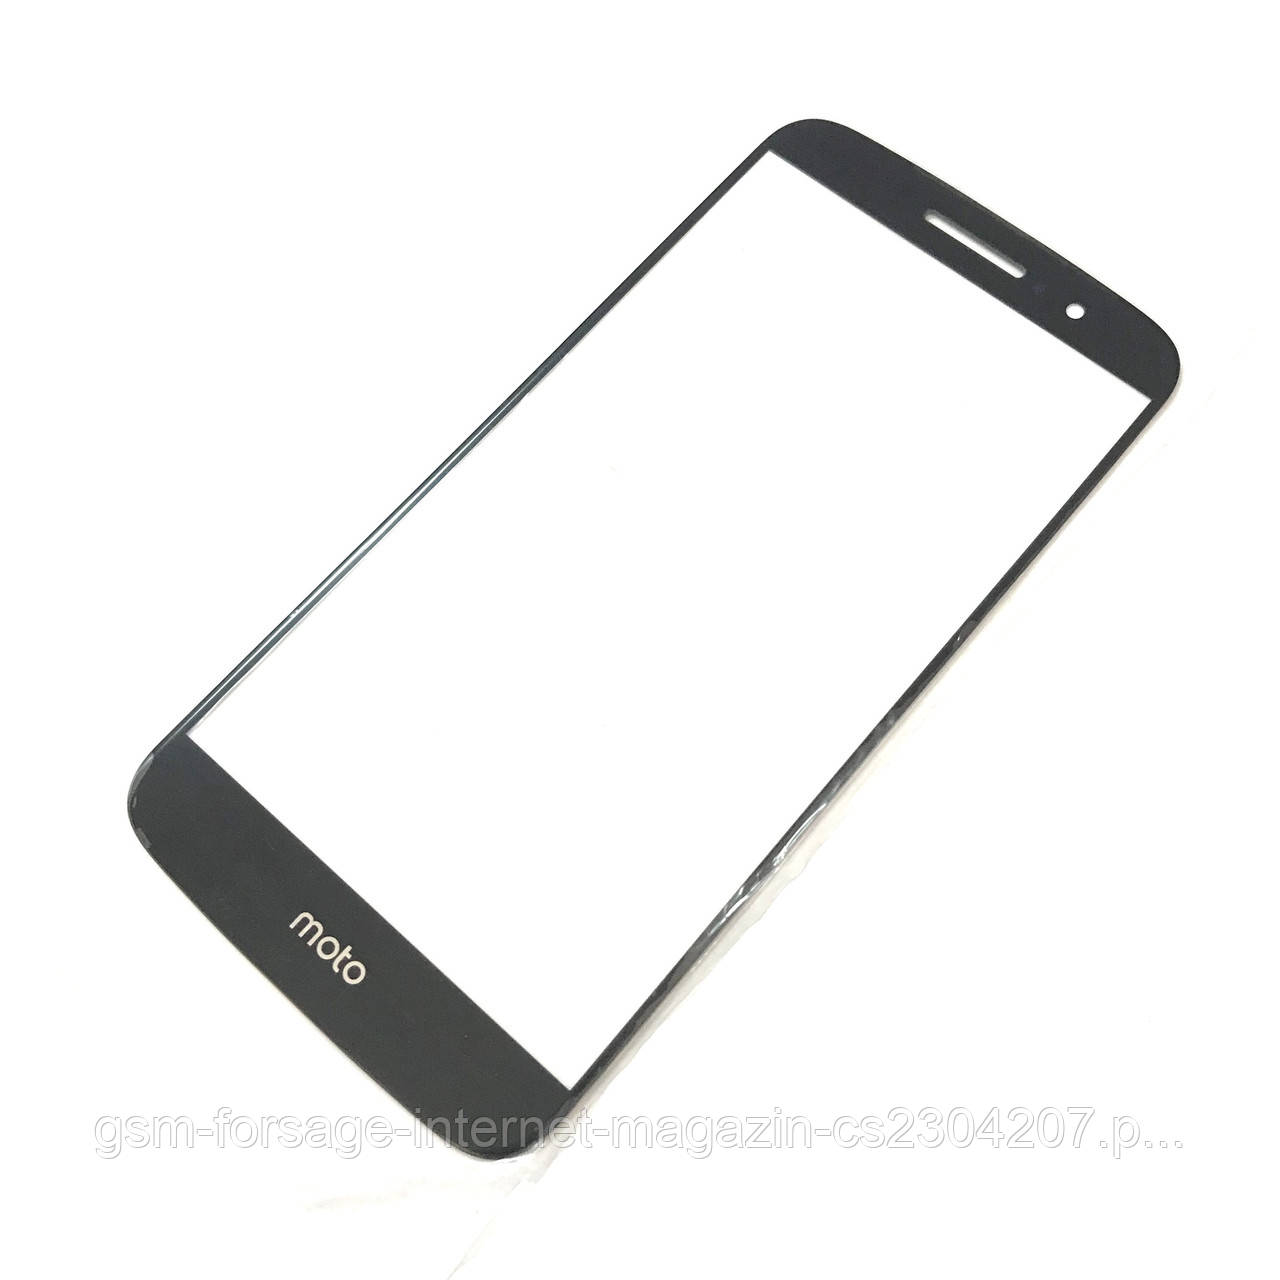 Стекло дисплея Motorola XT1622 Moto M / XT1663 Moto M Black (для переклейки)